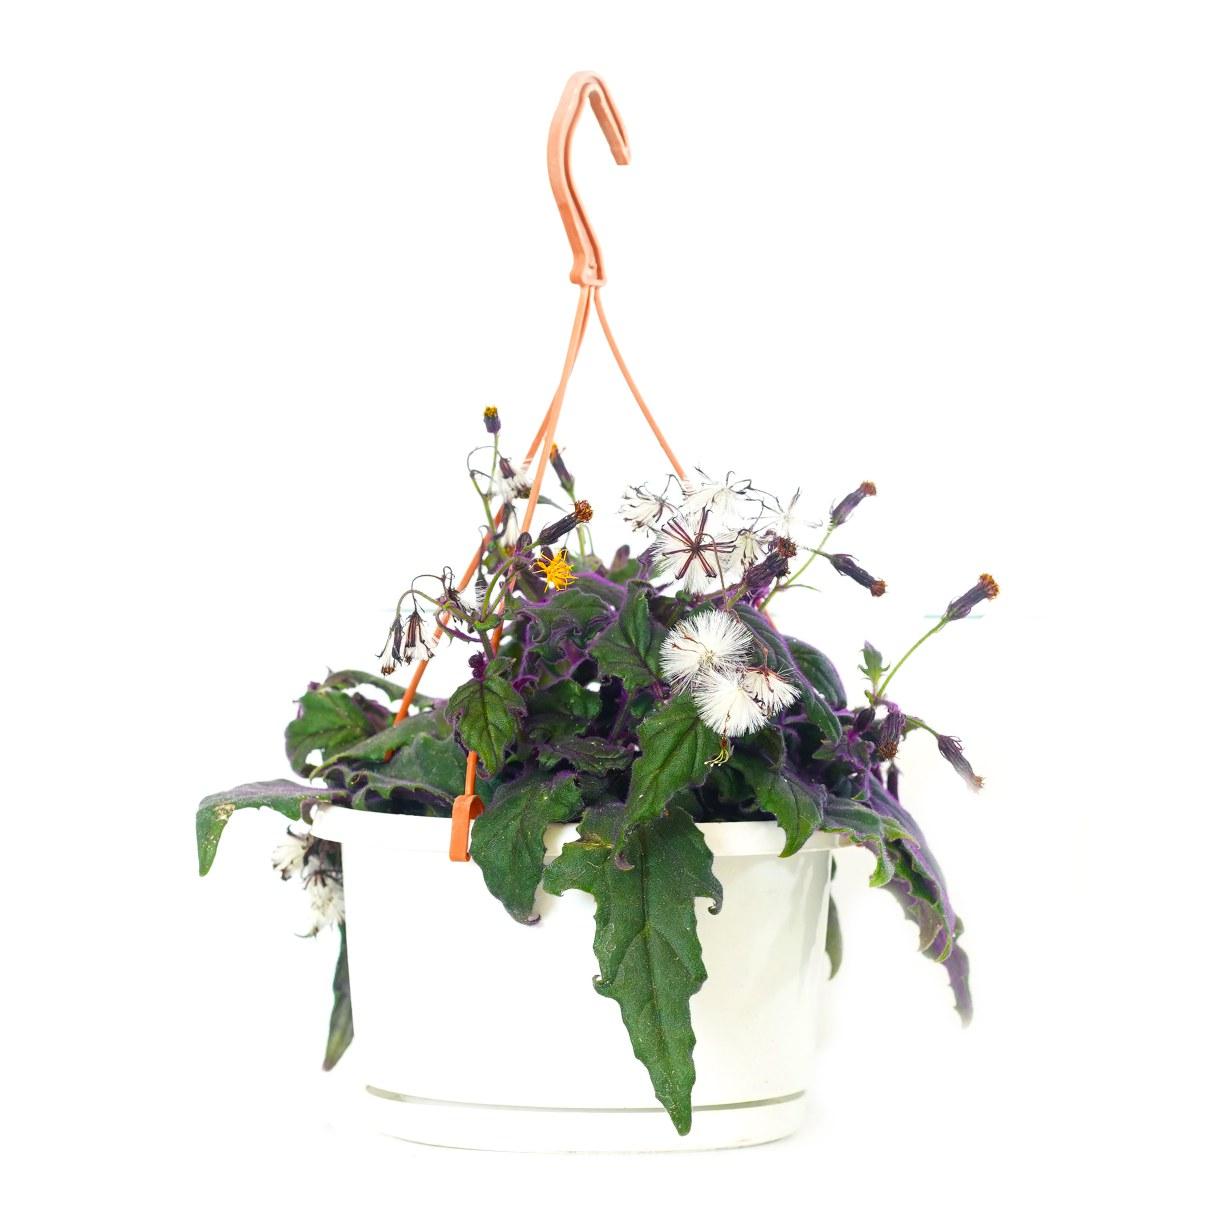 Gynura 'Indoor Plants'